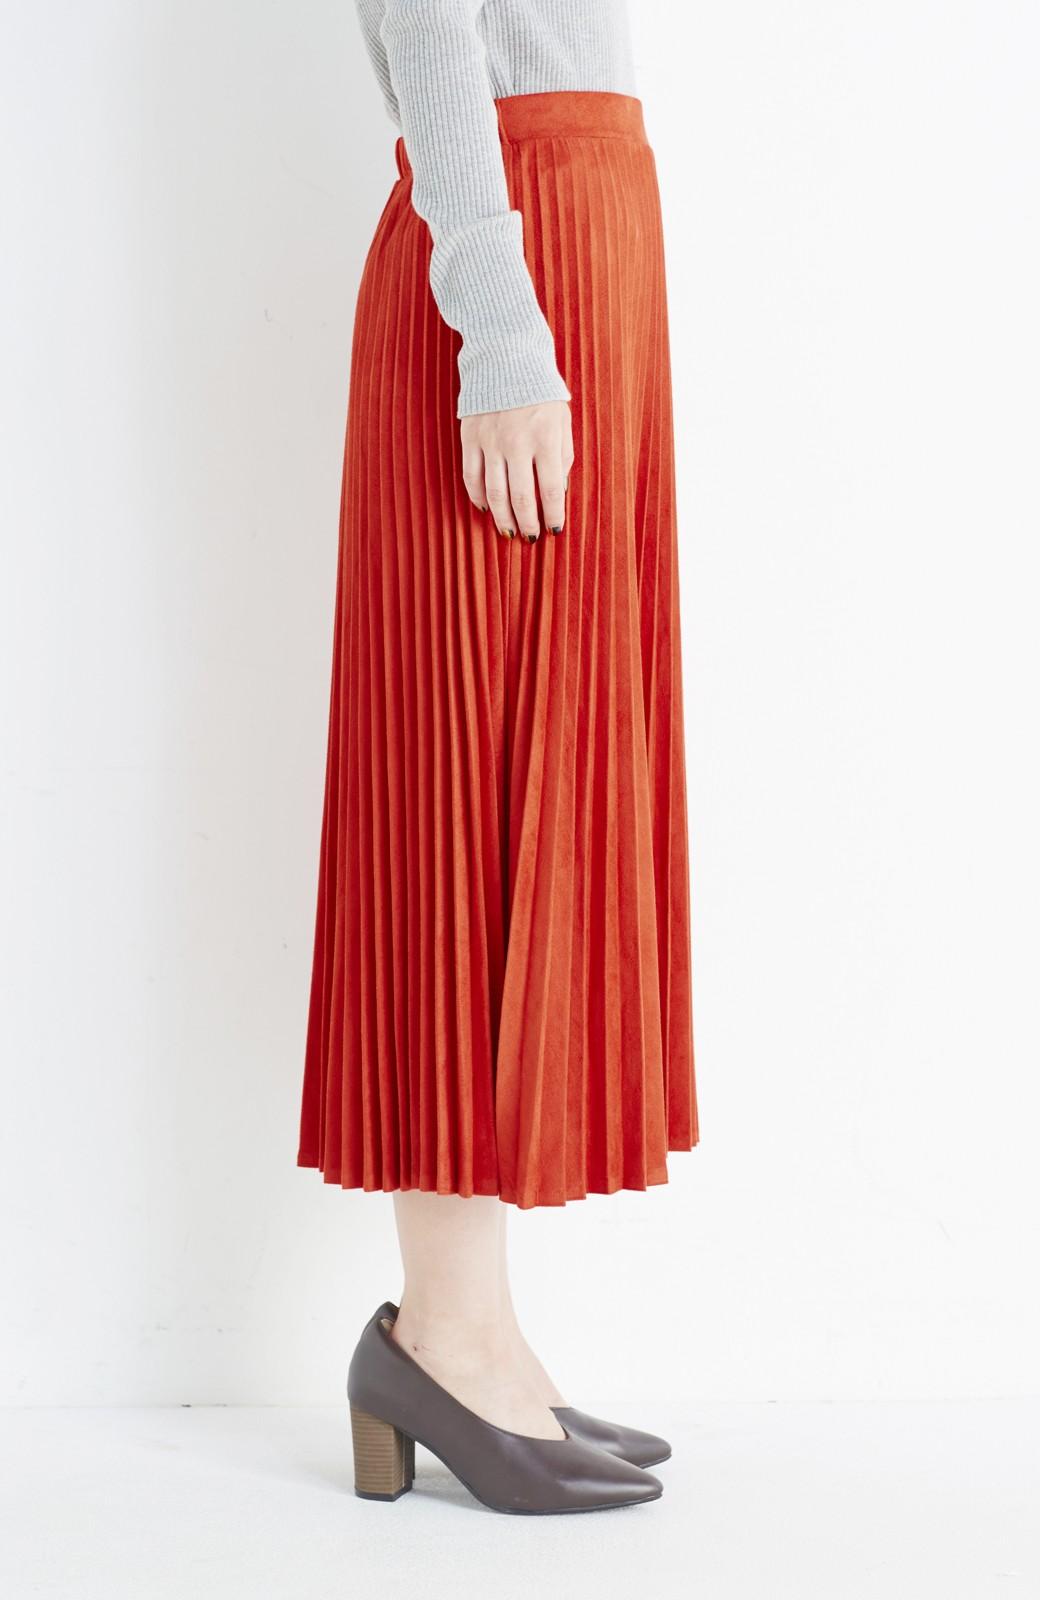 haco! 楽して女っぽい フェイクスエードのプリーツスカート  by que made me <オレンジ系その他>の商品写真4